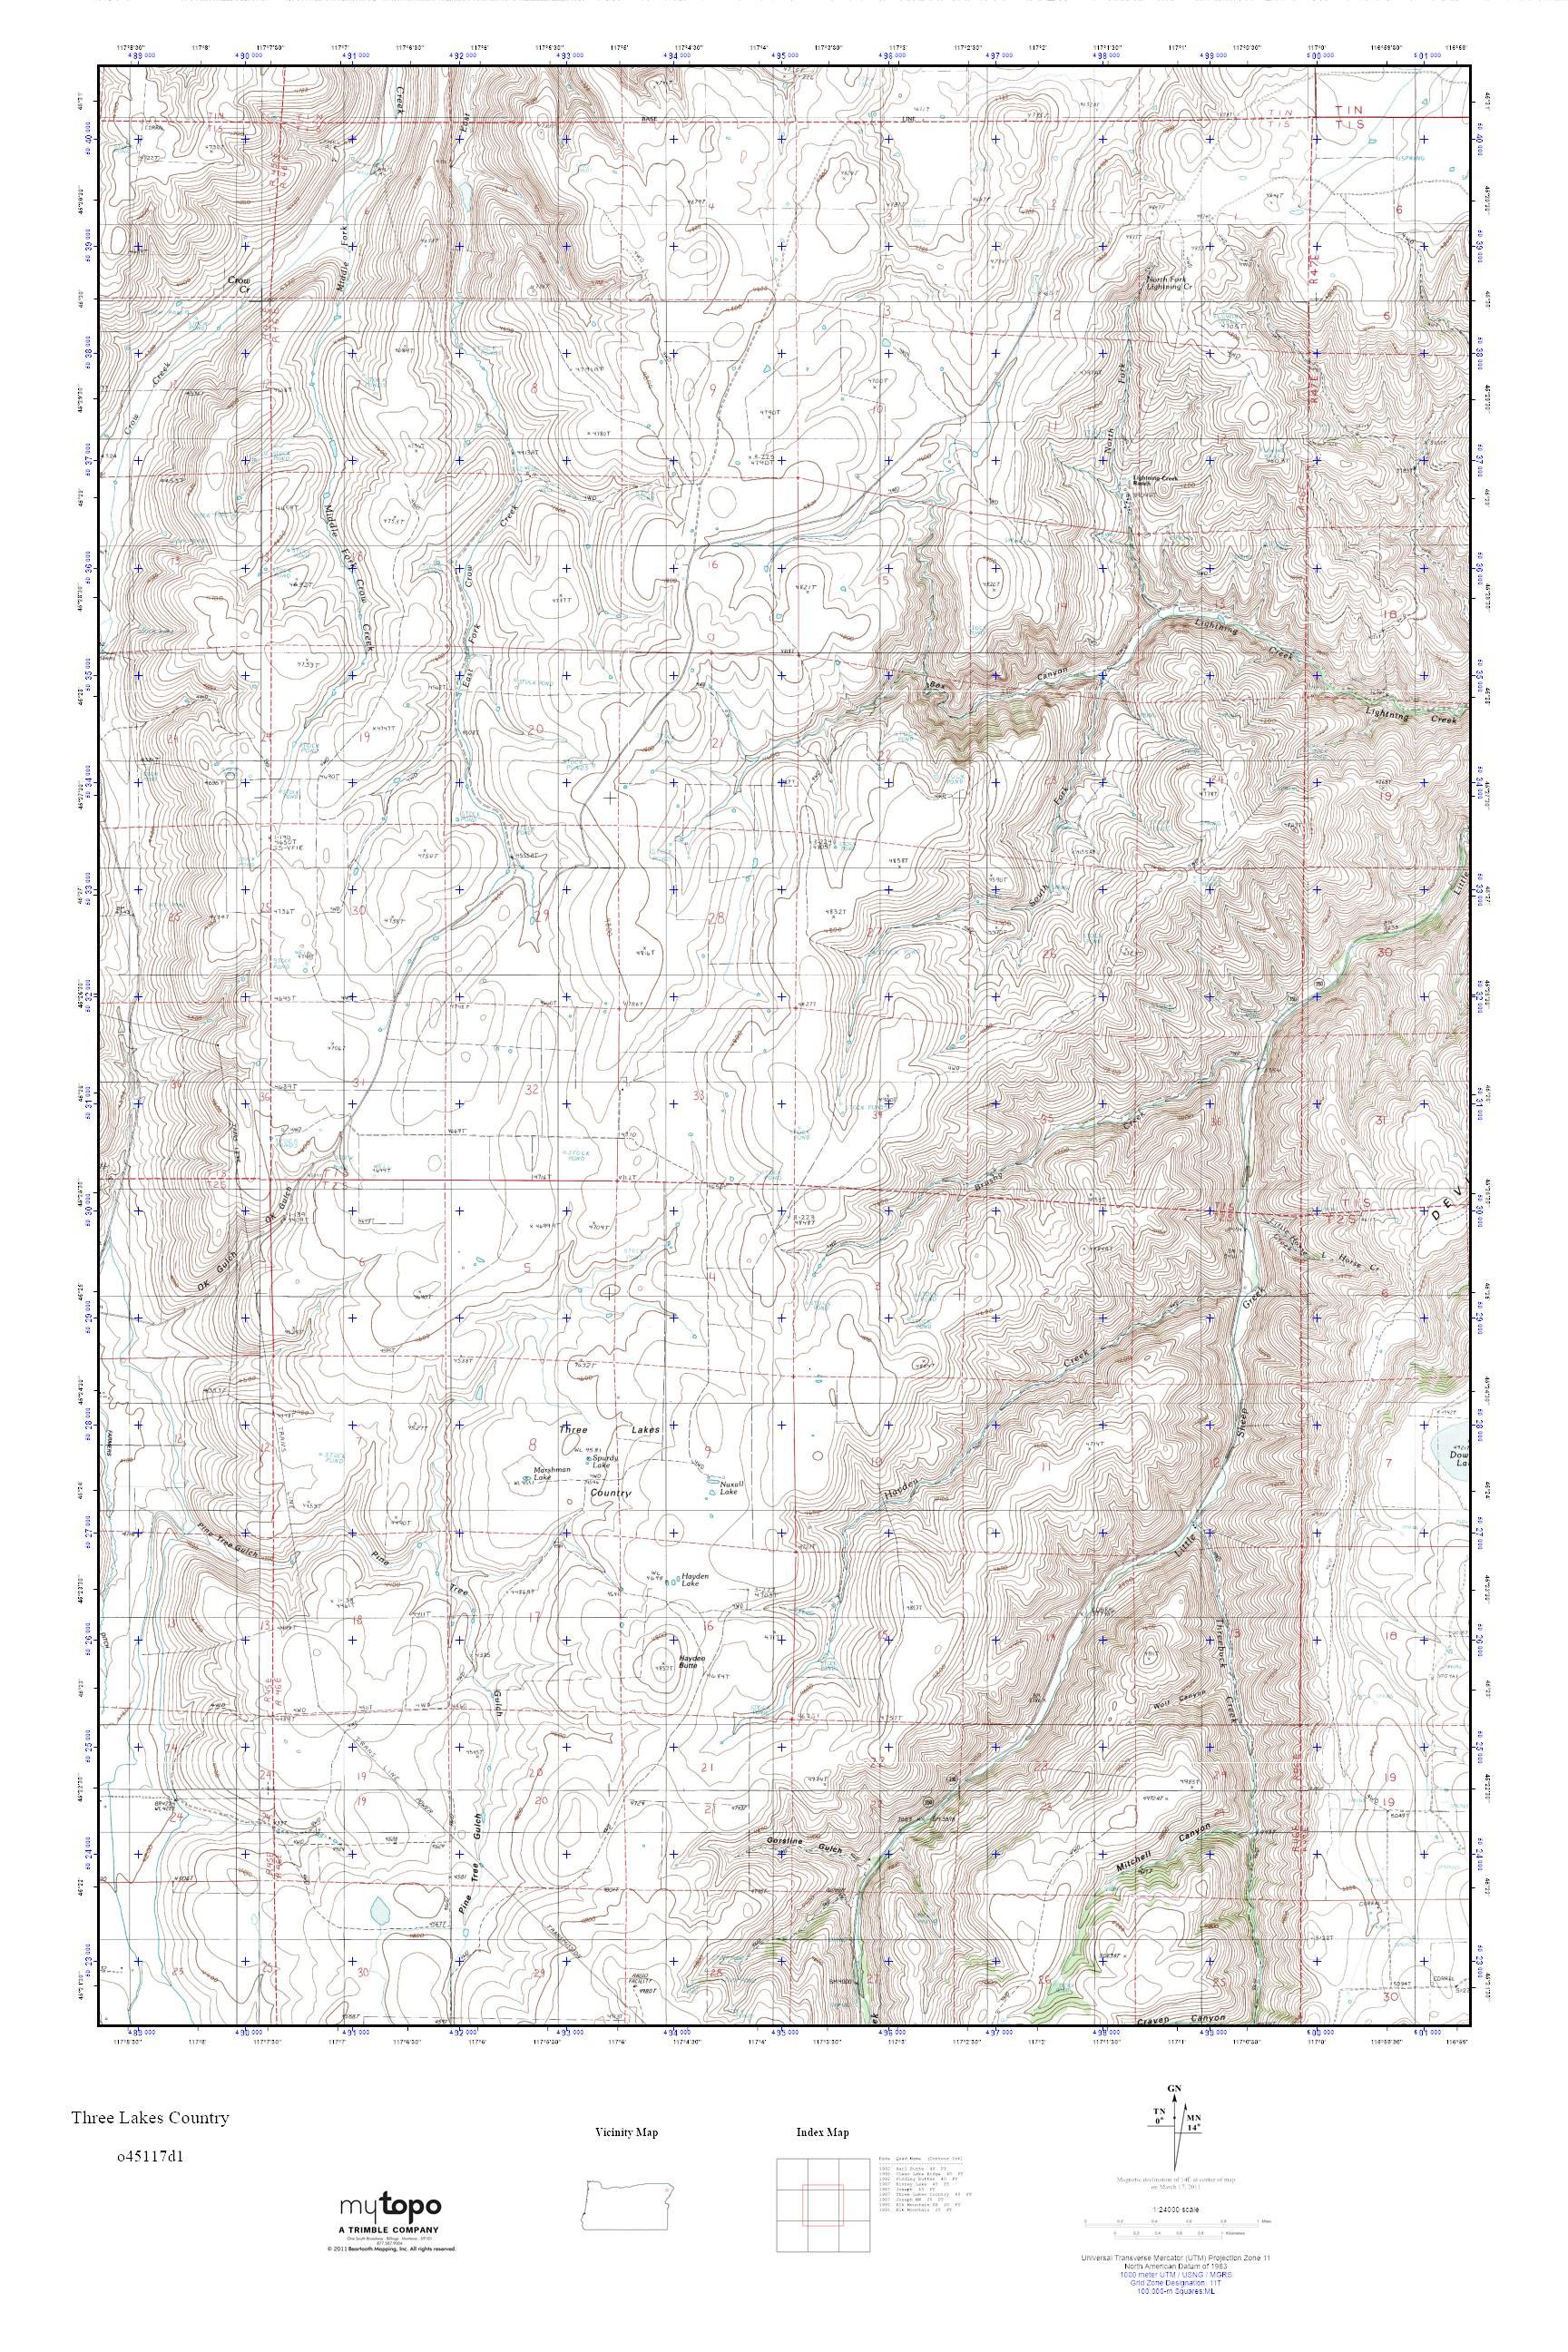 Mytopo Three Lakes Country Oregon Usgs Quad Topo Map